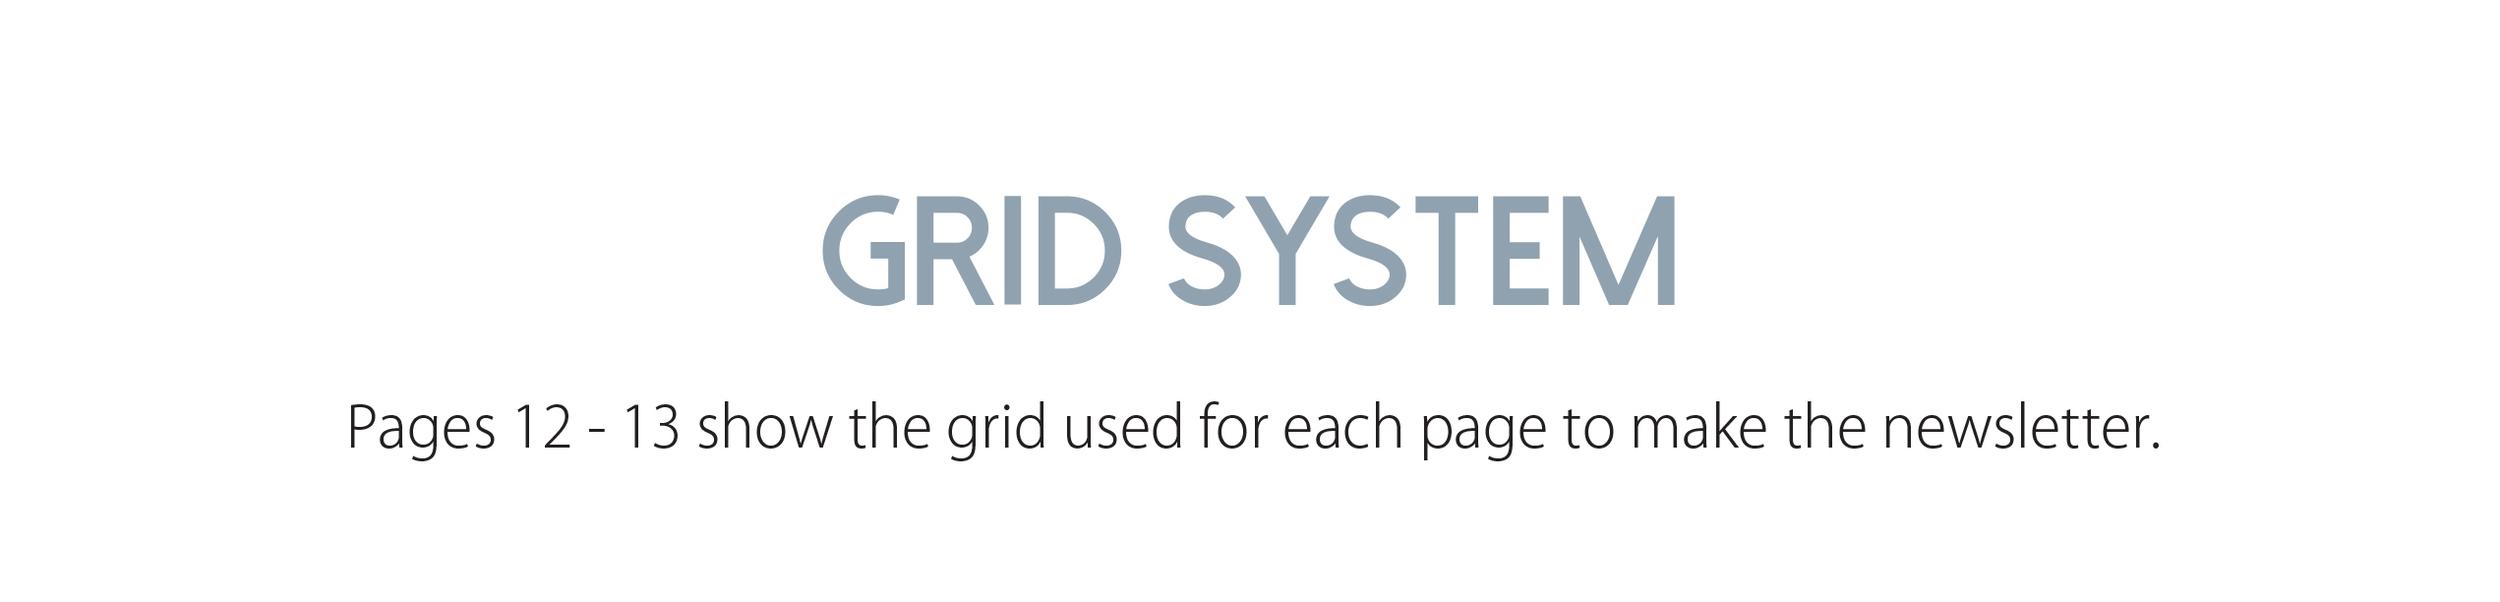 Corry_DesignSystem-11 copy.jpg